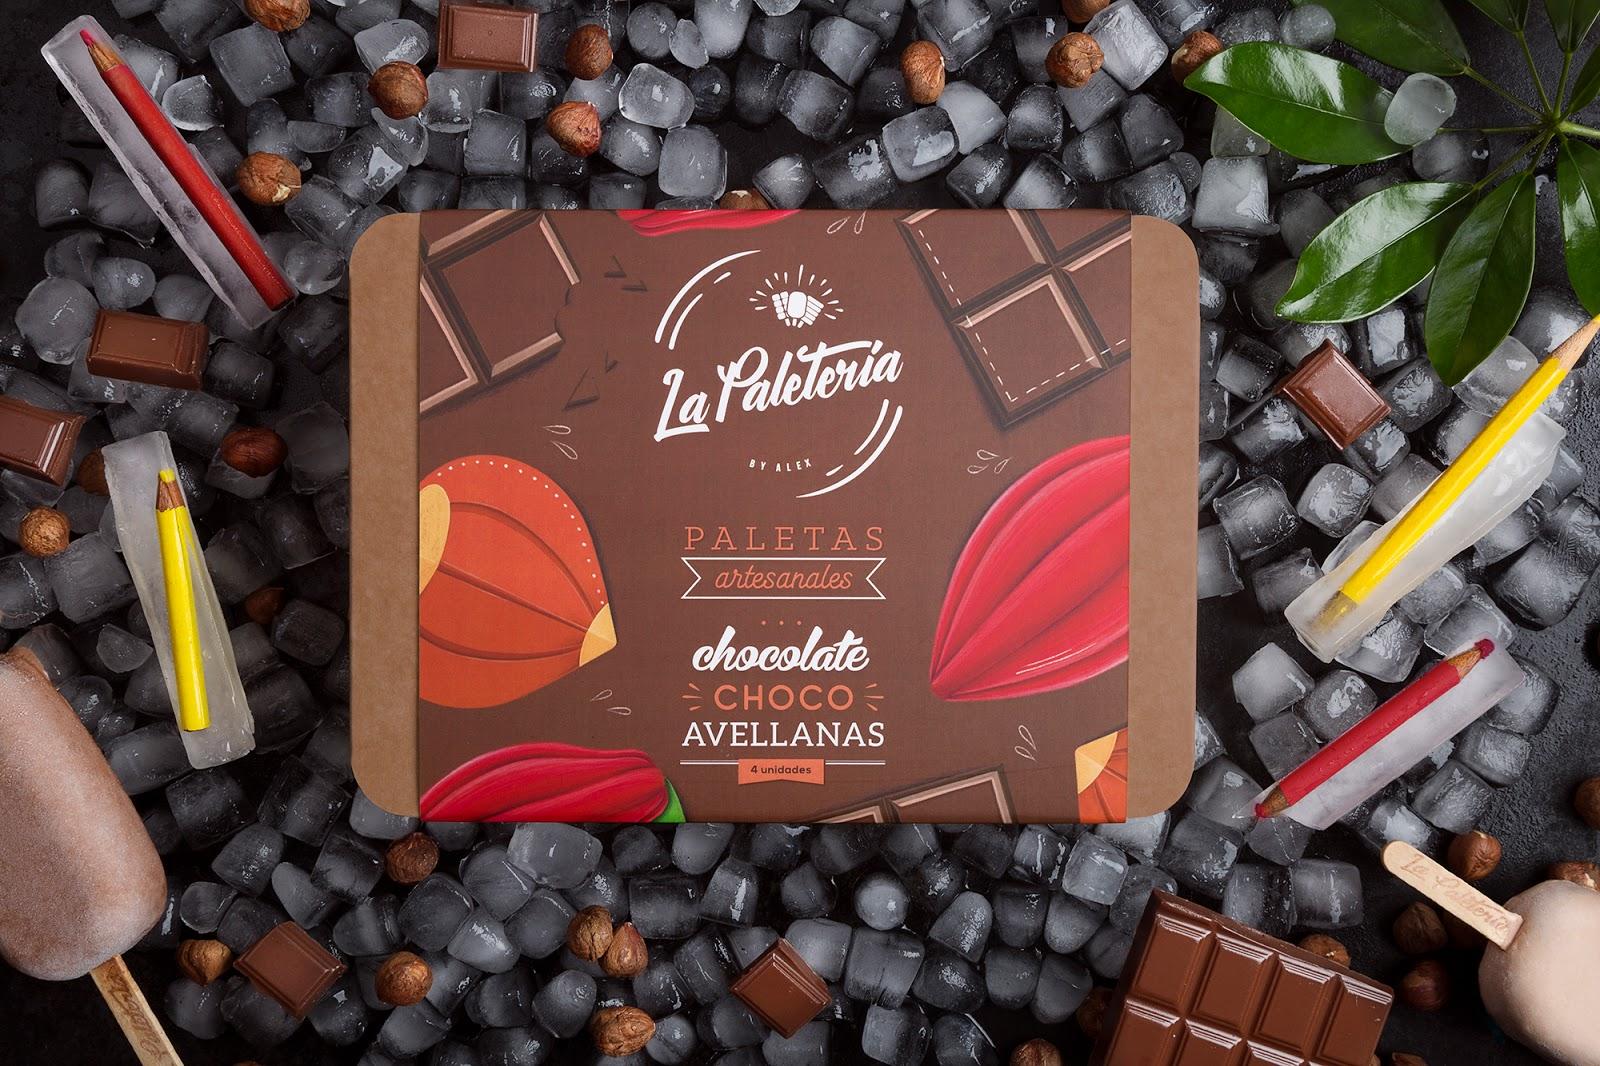 La Paletería冰棒包装盒设计